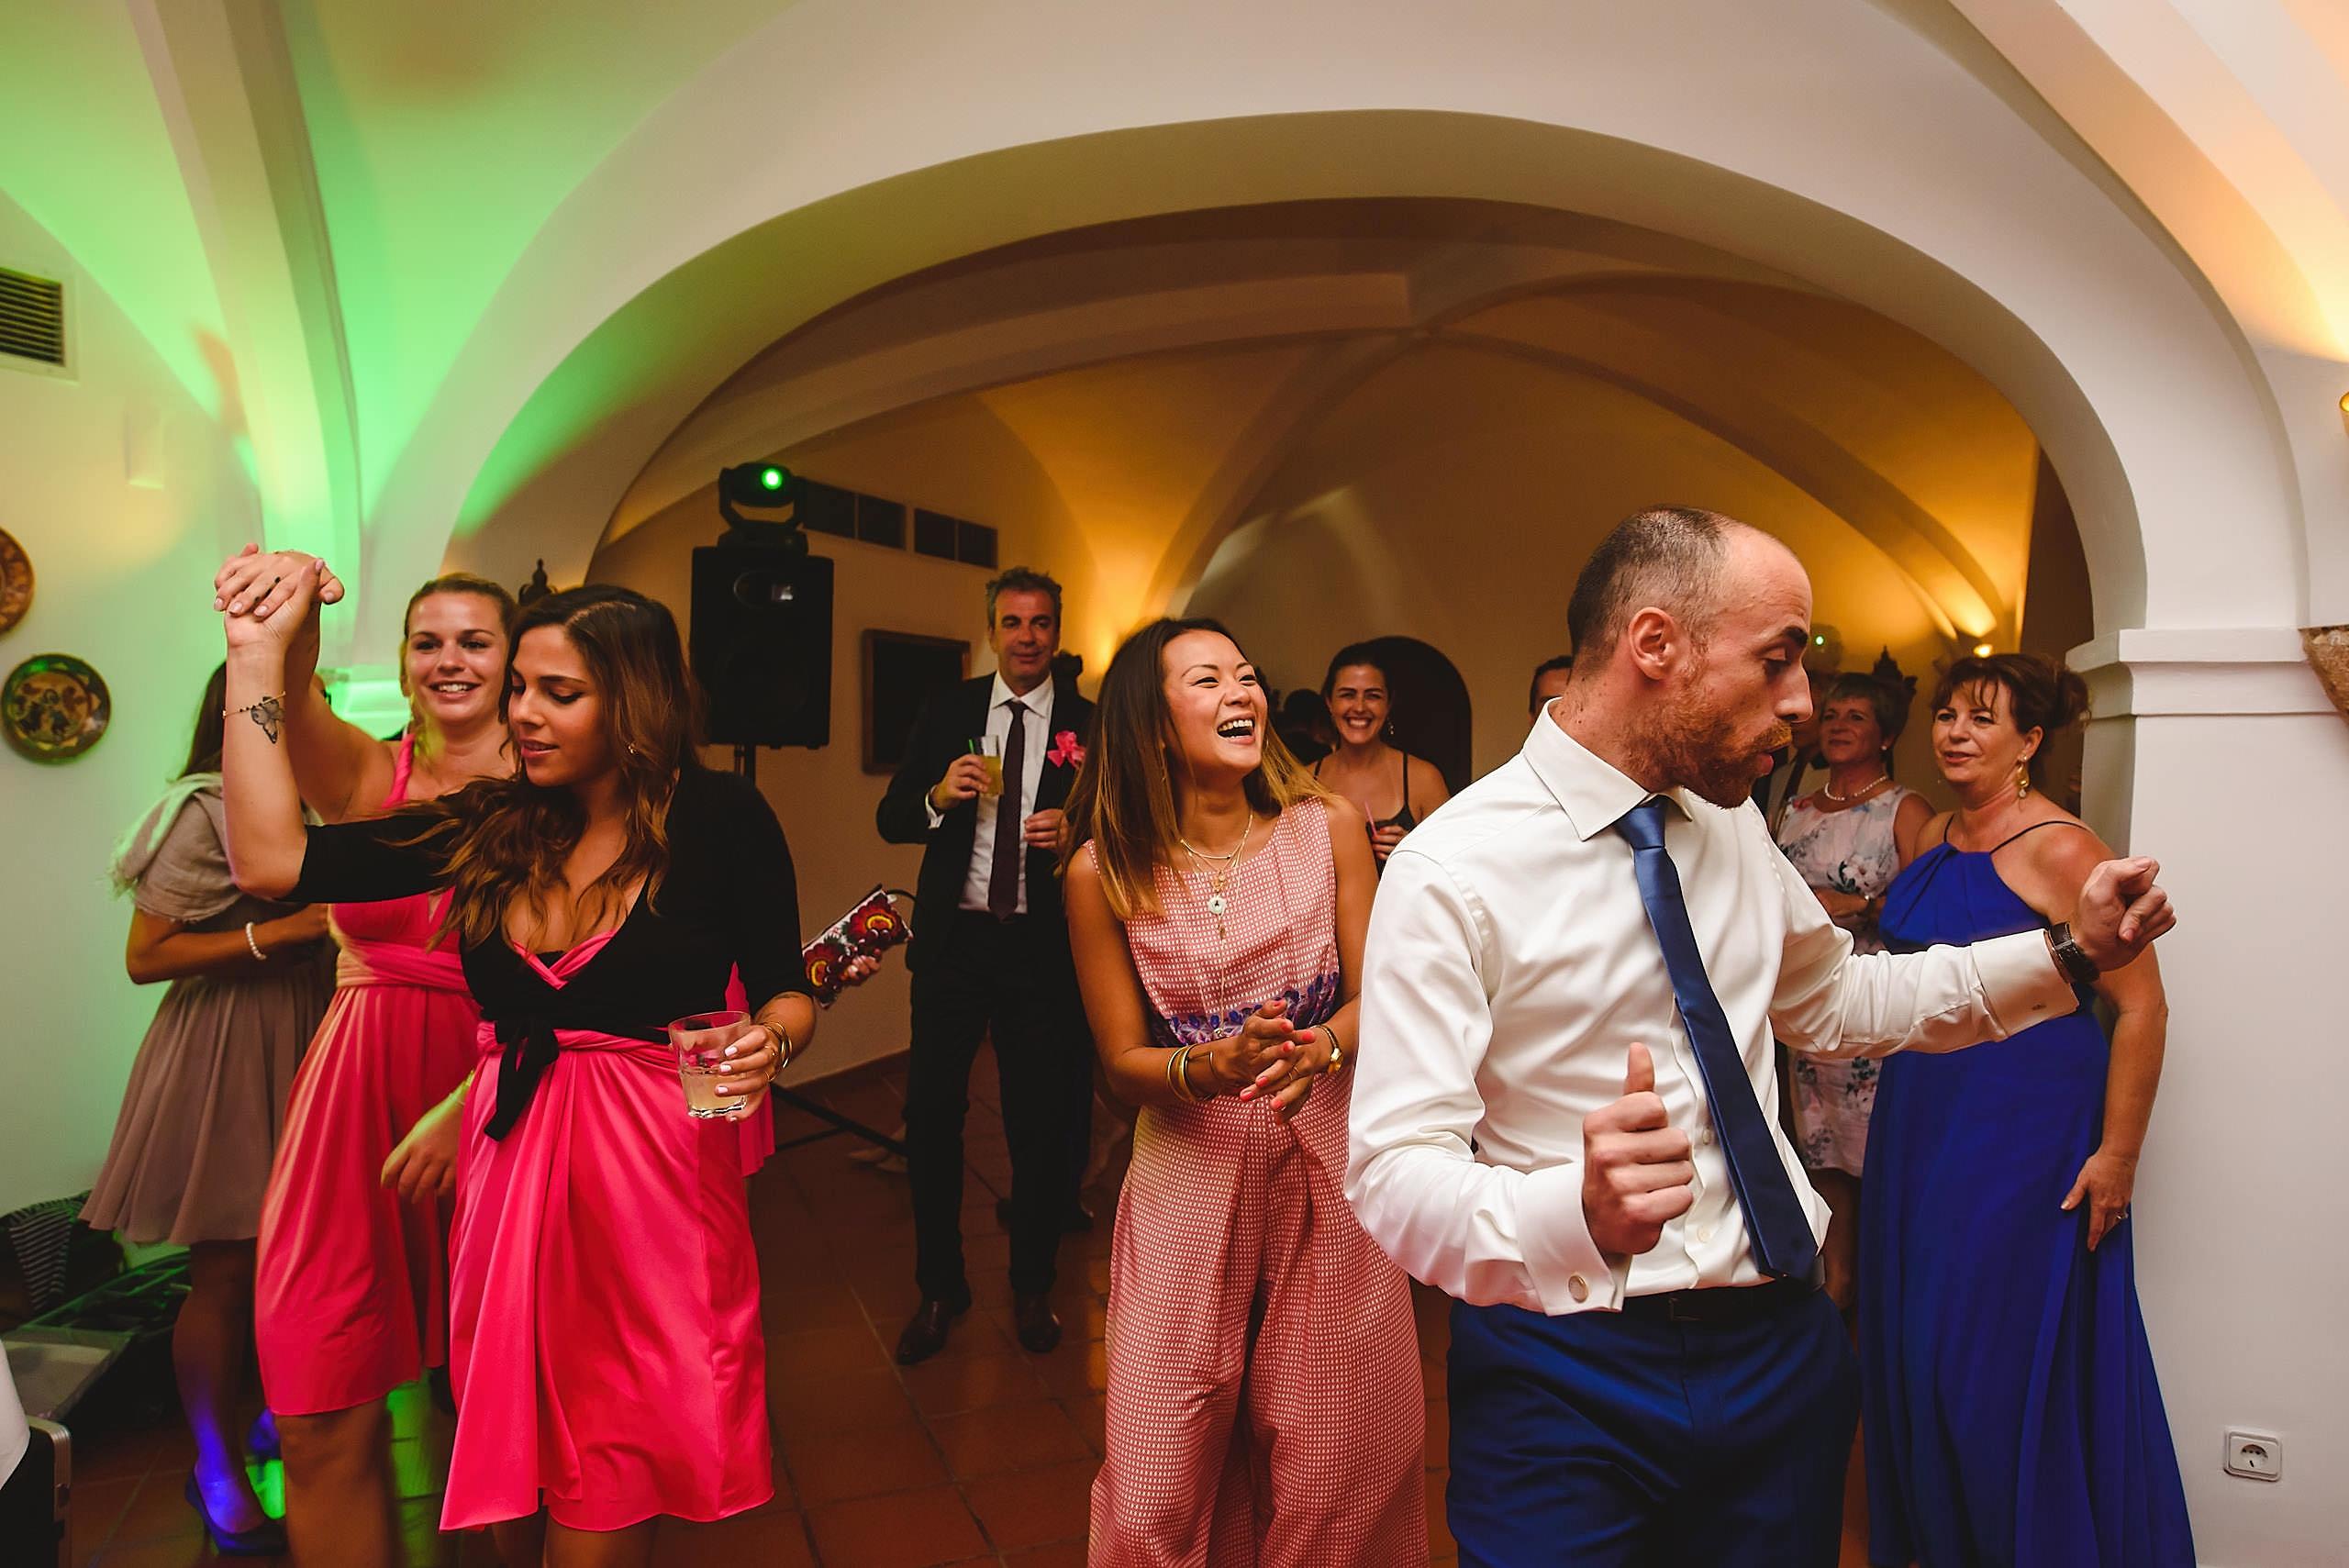 alentejo-portugal-wedding-066